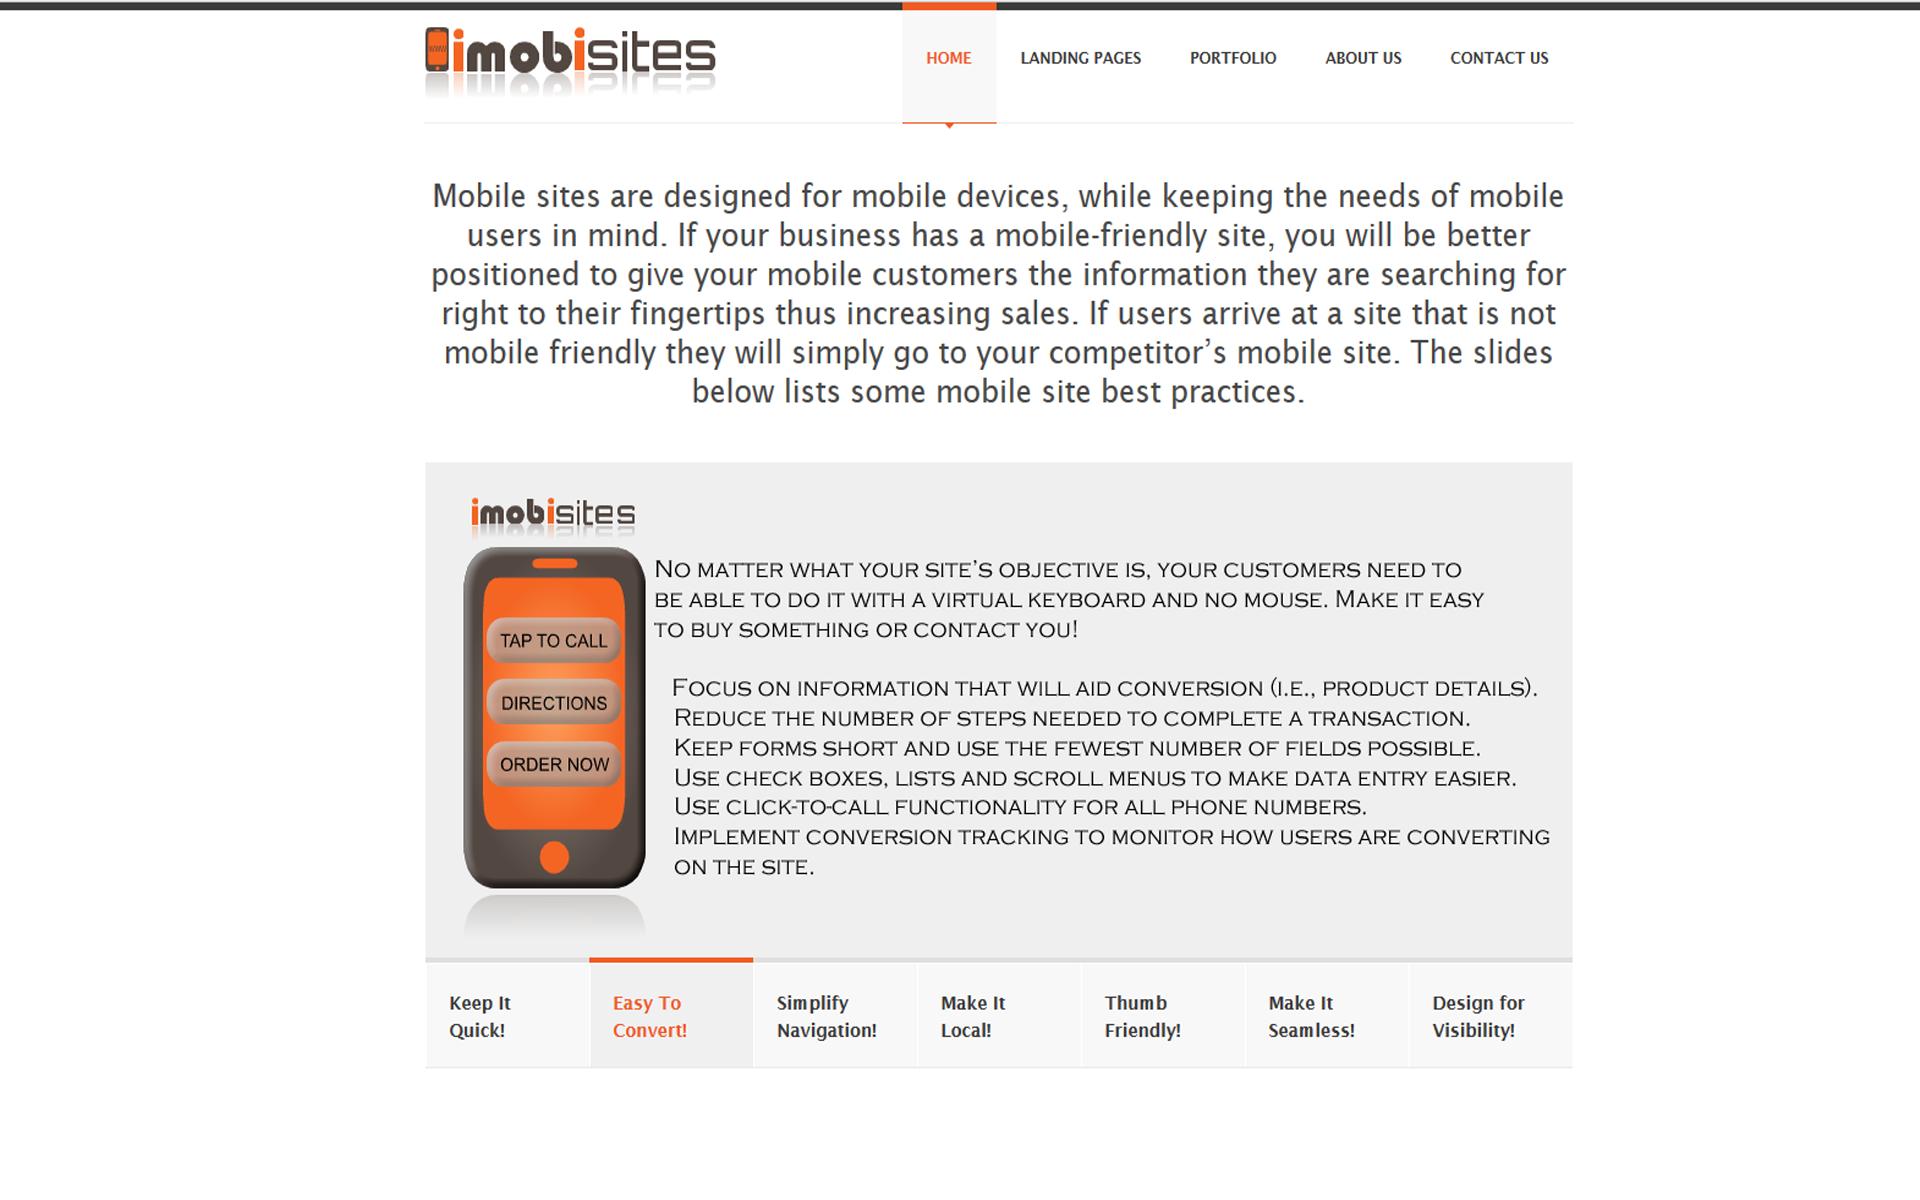 iMobiSites Twapp Media Web Design